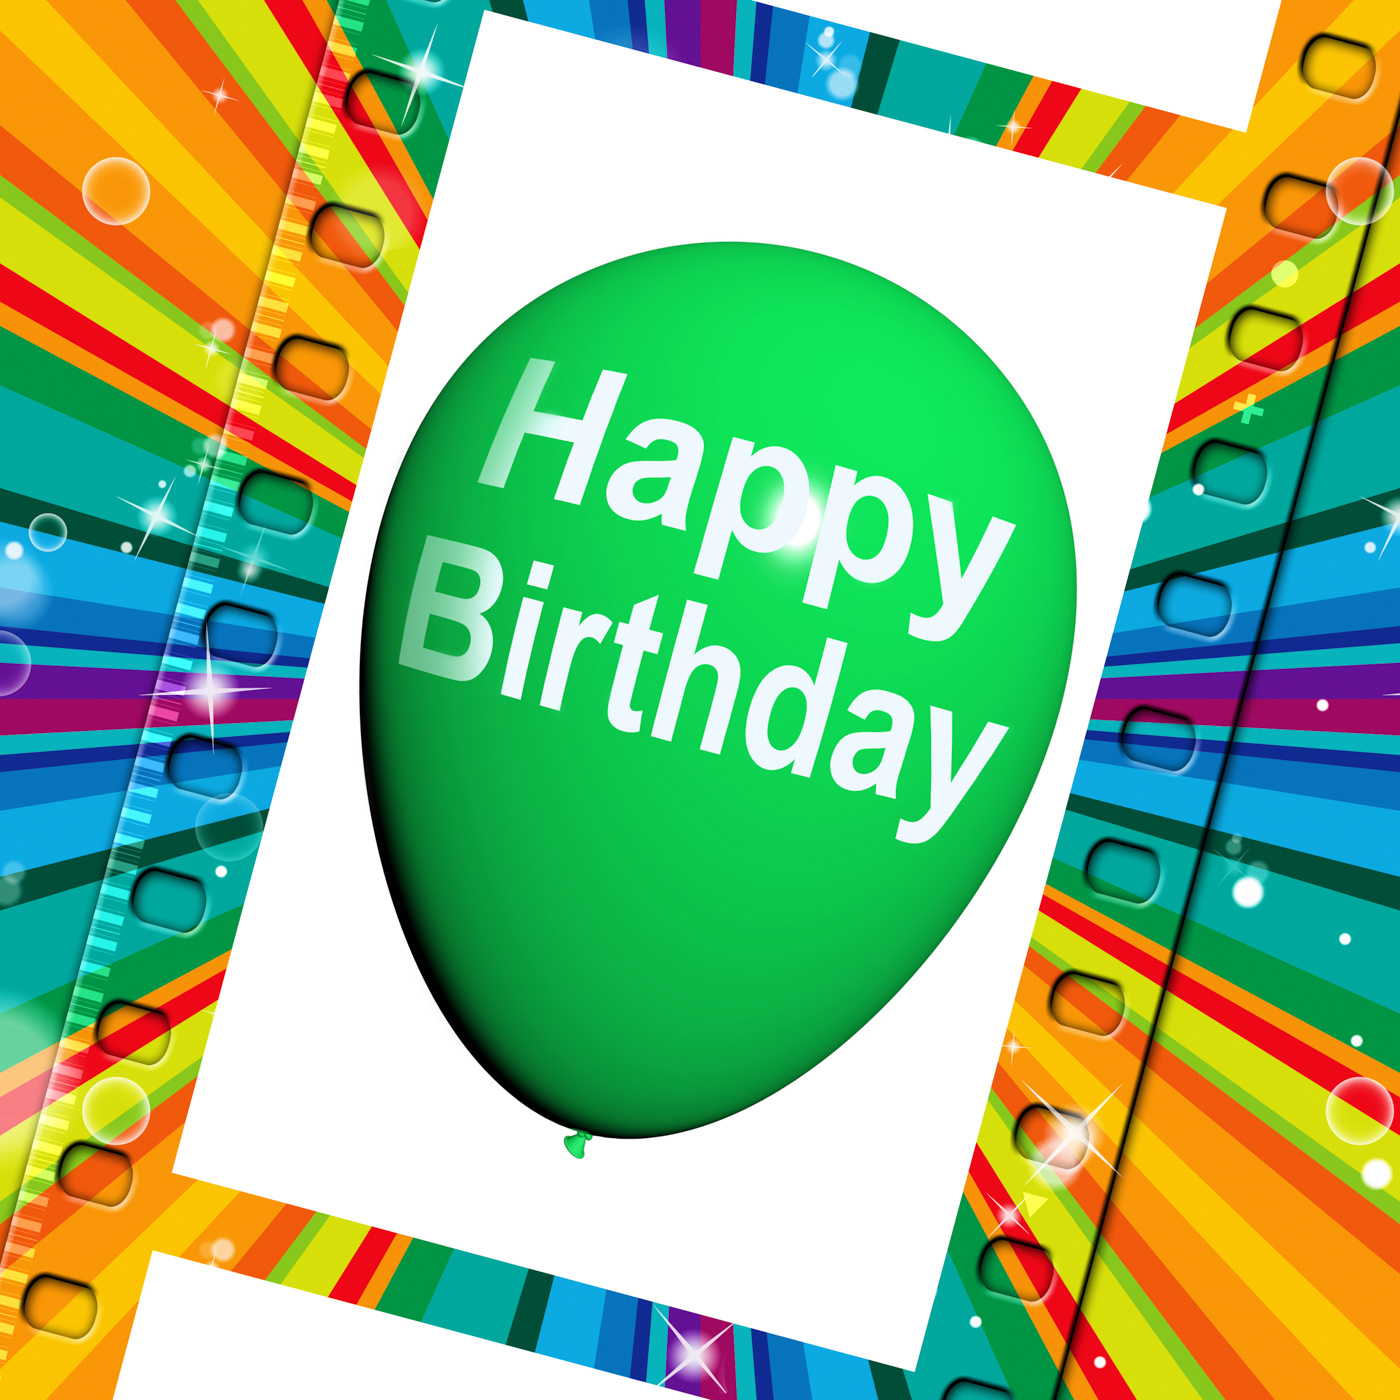 Happy Birthday Balloon Shows Cheerful Festivities and Party, Balloon, Birthday, Birthdays, Celebrate, HQ Photo